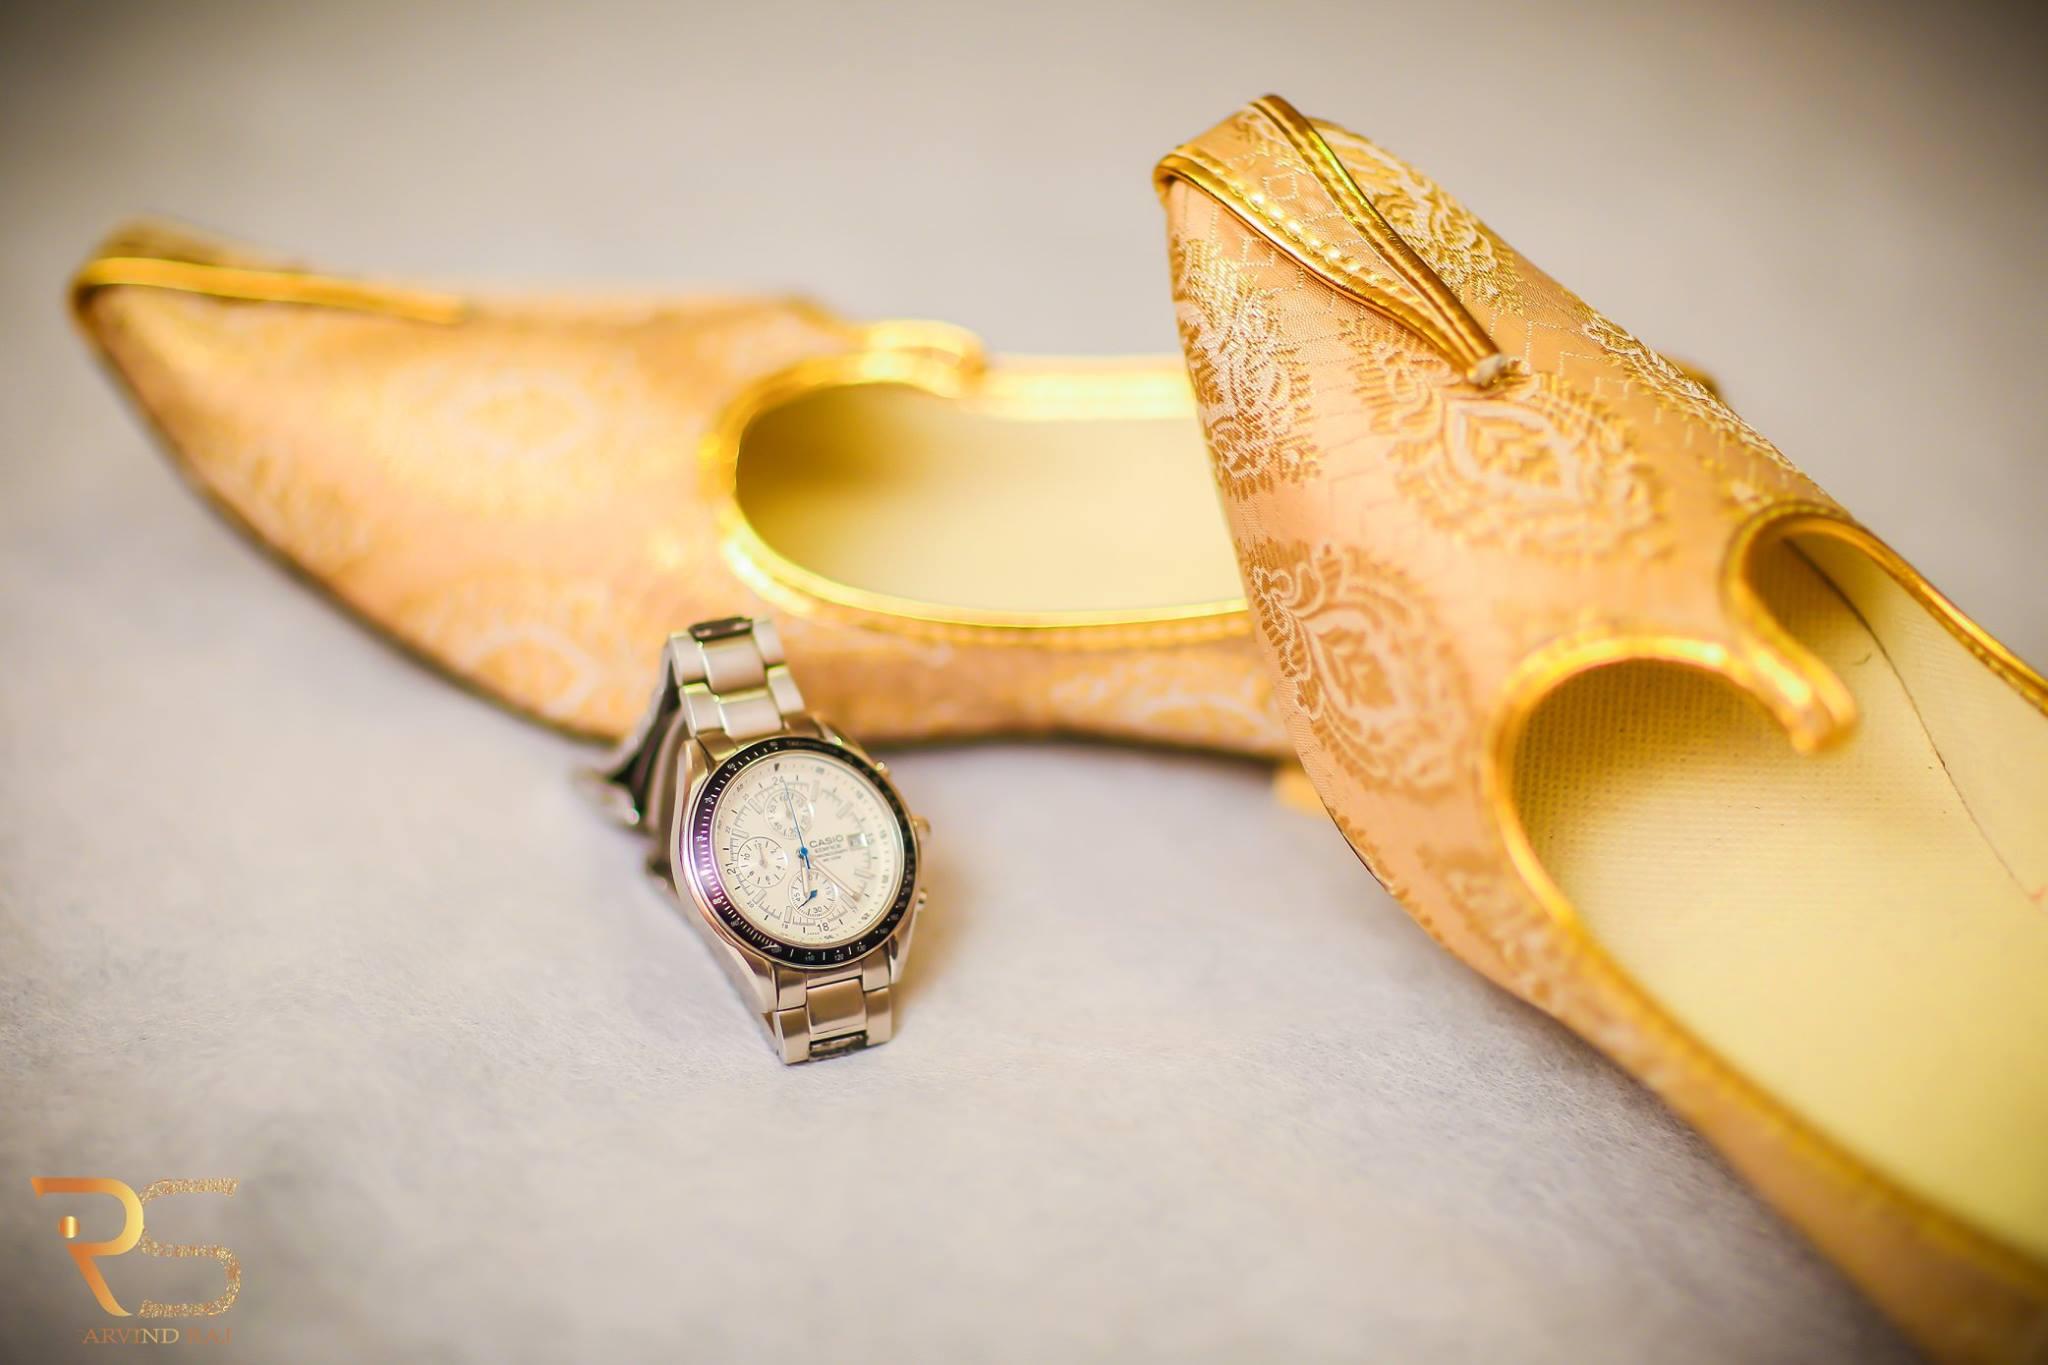 Golden Color Groom Shoe with watch